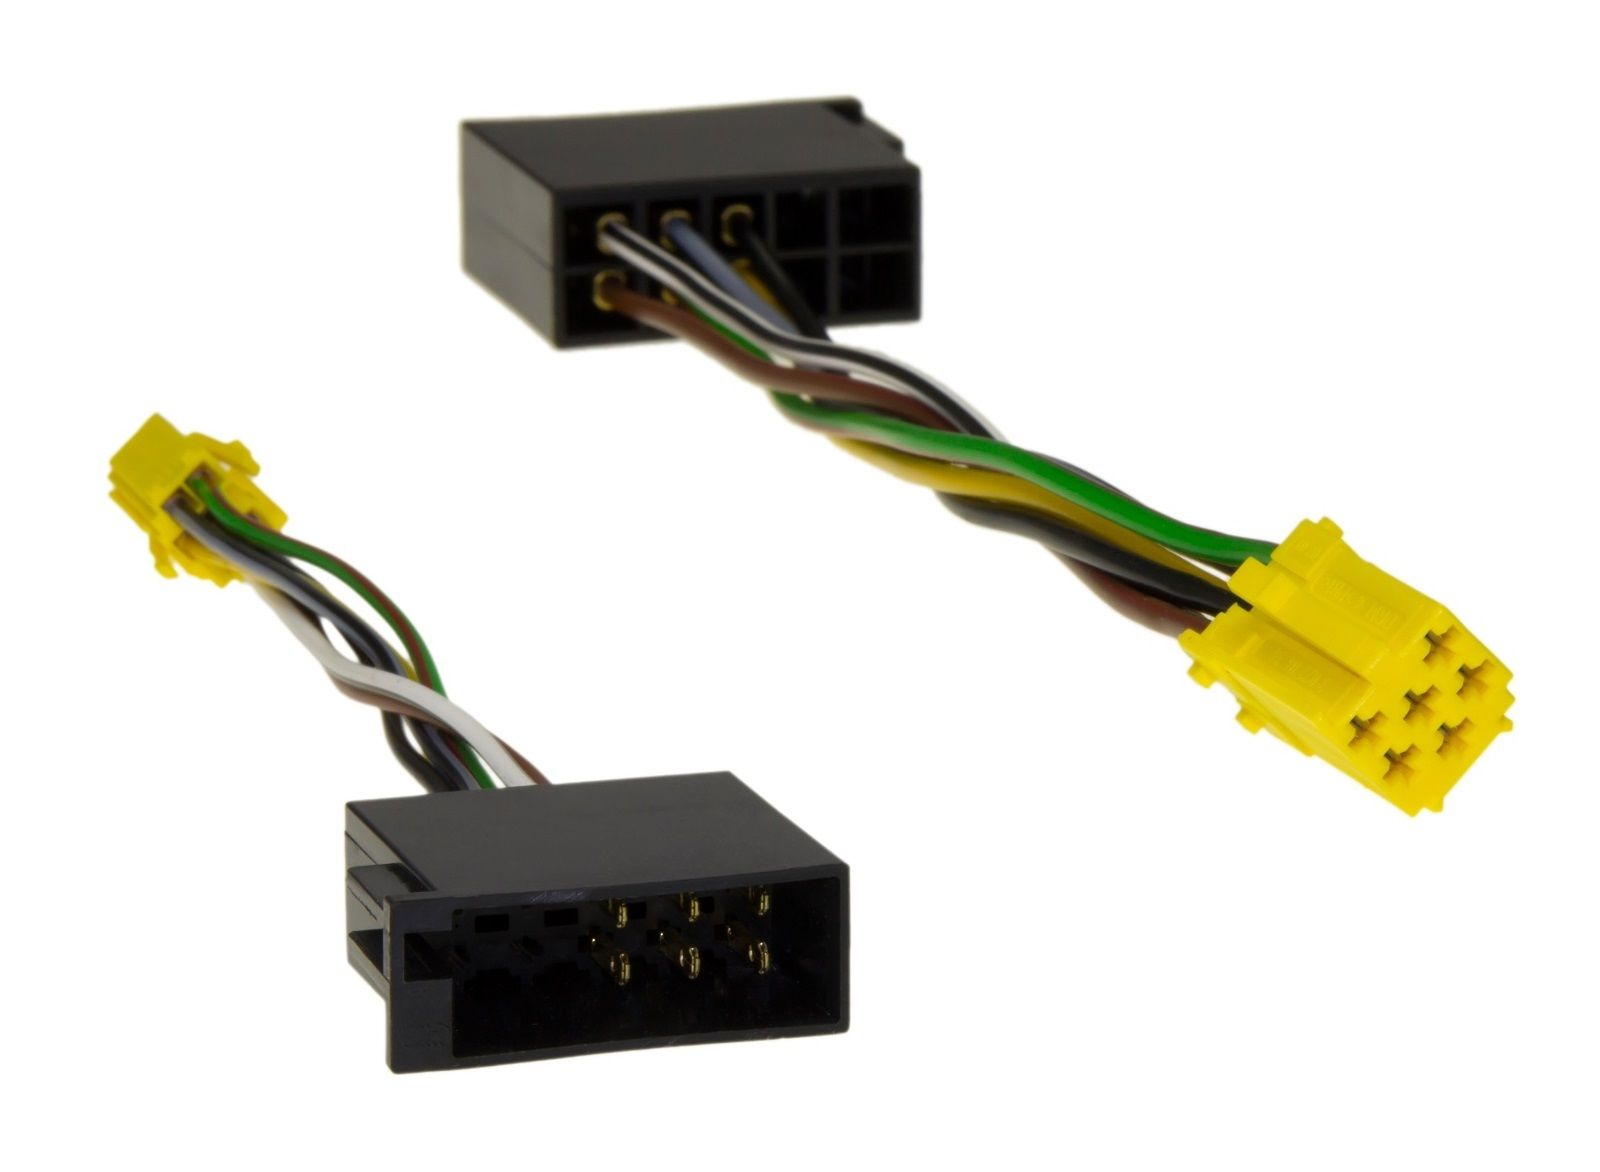 line out adapter kabel mini iso 6pol buchse auf iso 10pol. Black Bedroom Furniture Sets. Home Design Ideas